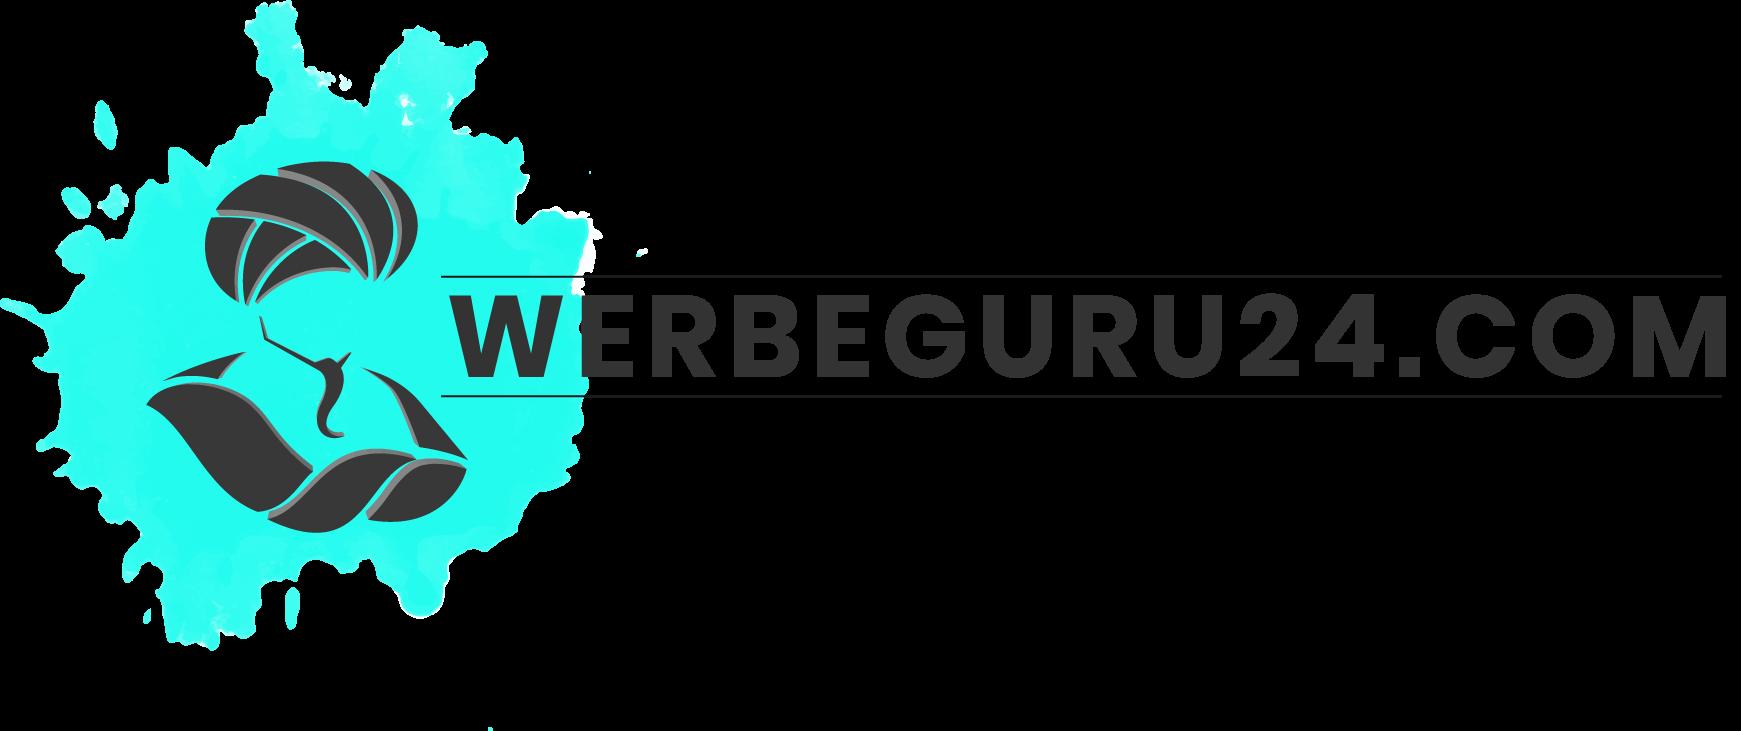 Werbeguru24.com